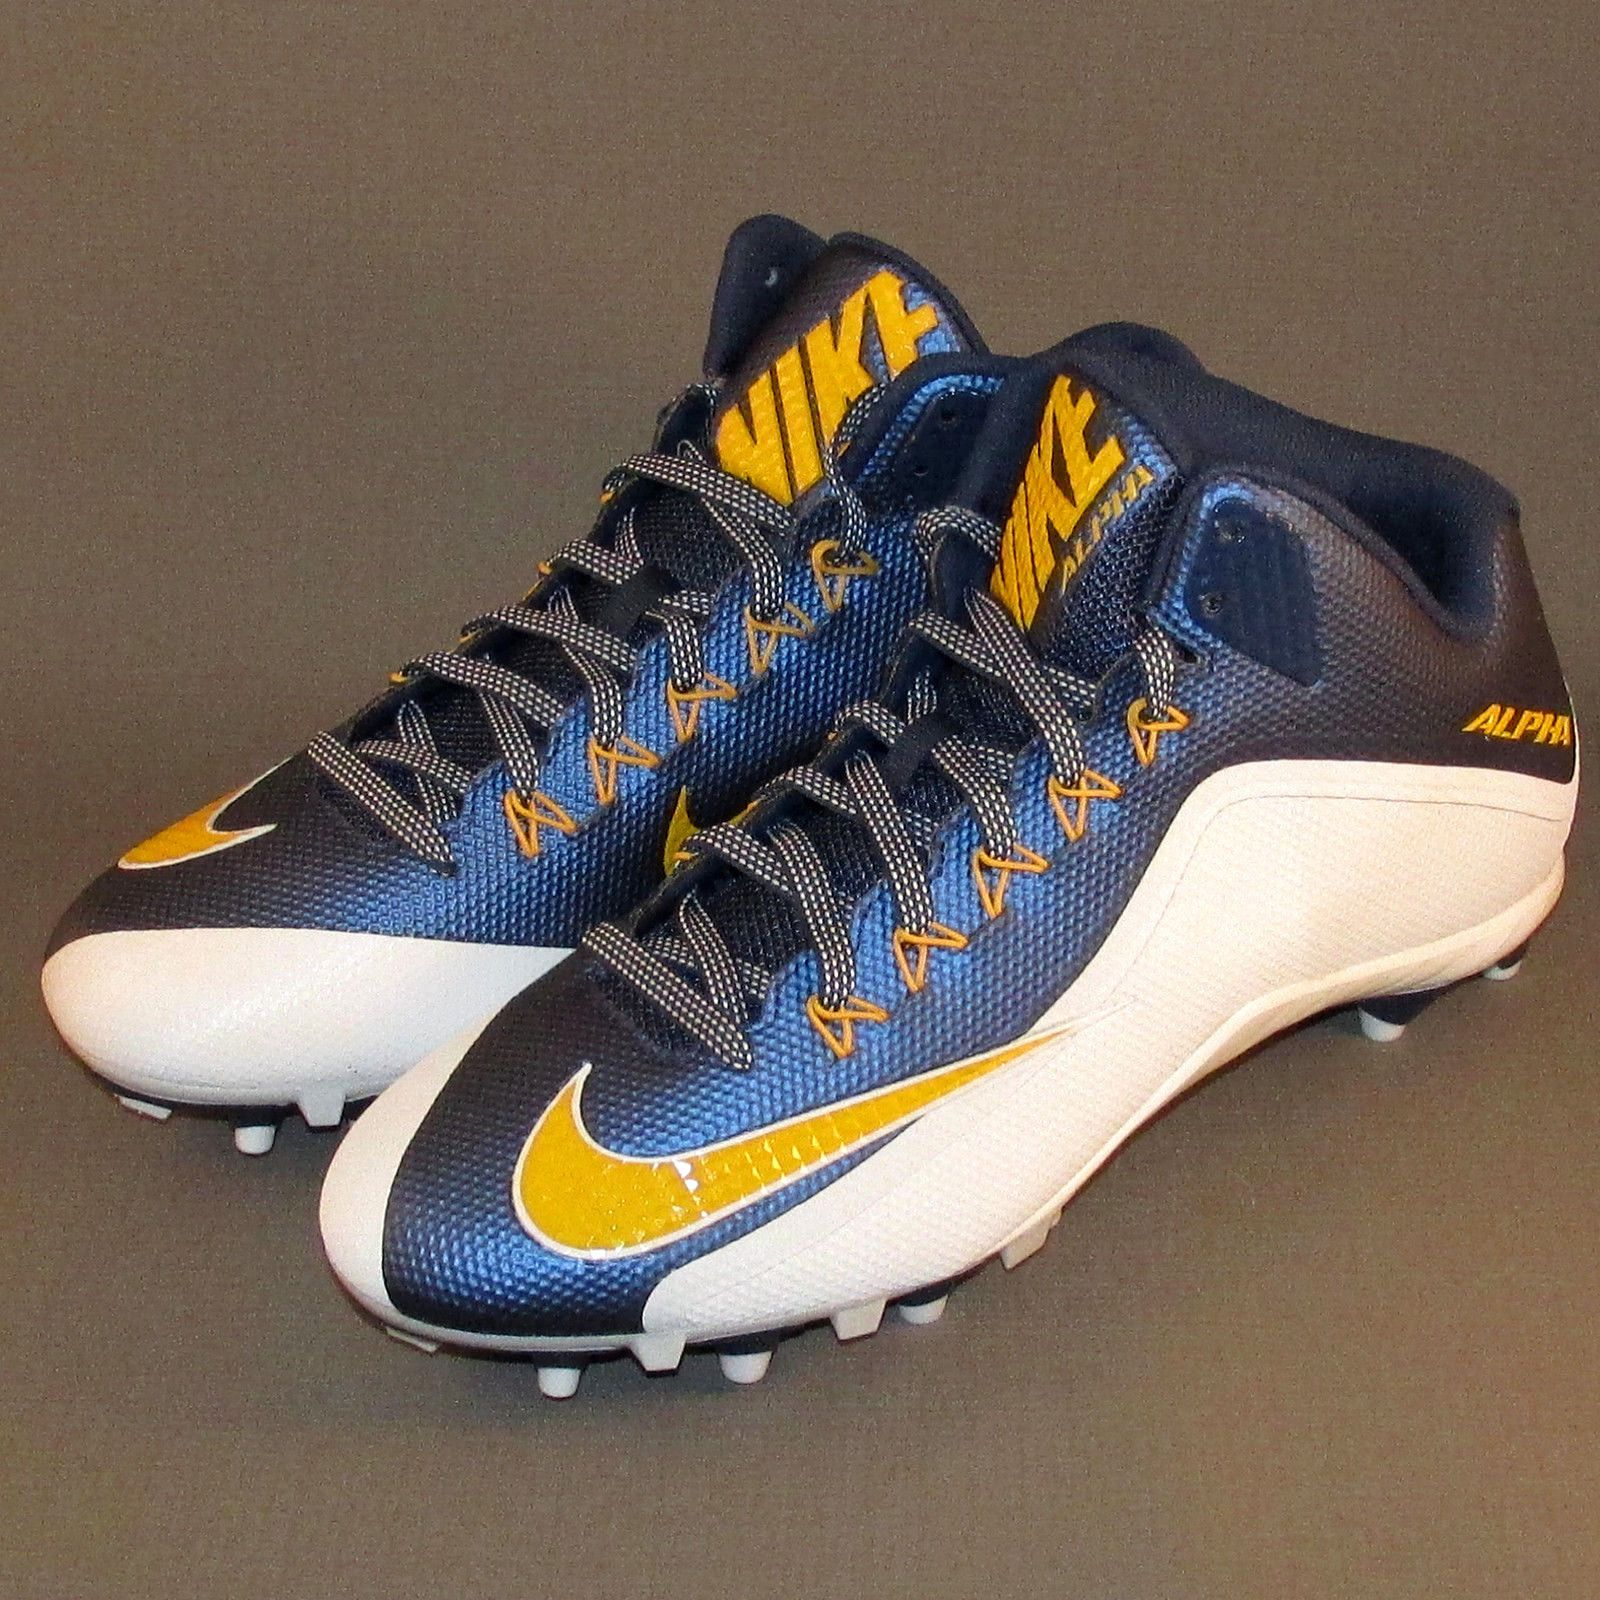 Nike alpha pro td football cleats mens size 12 bluegold